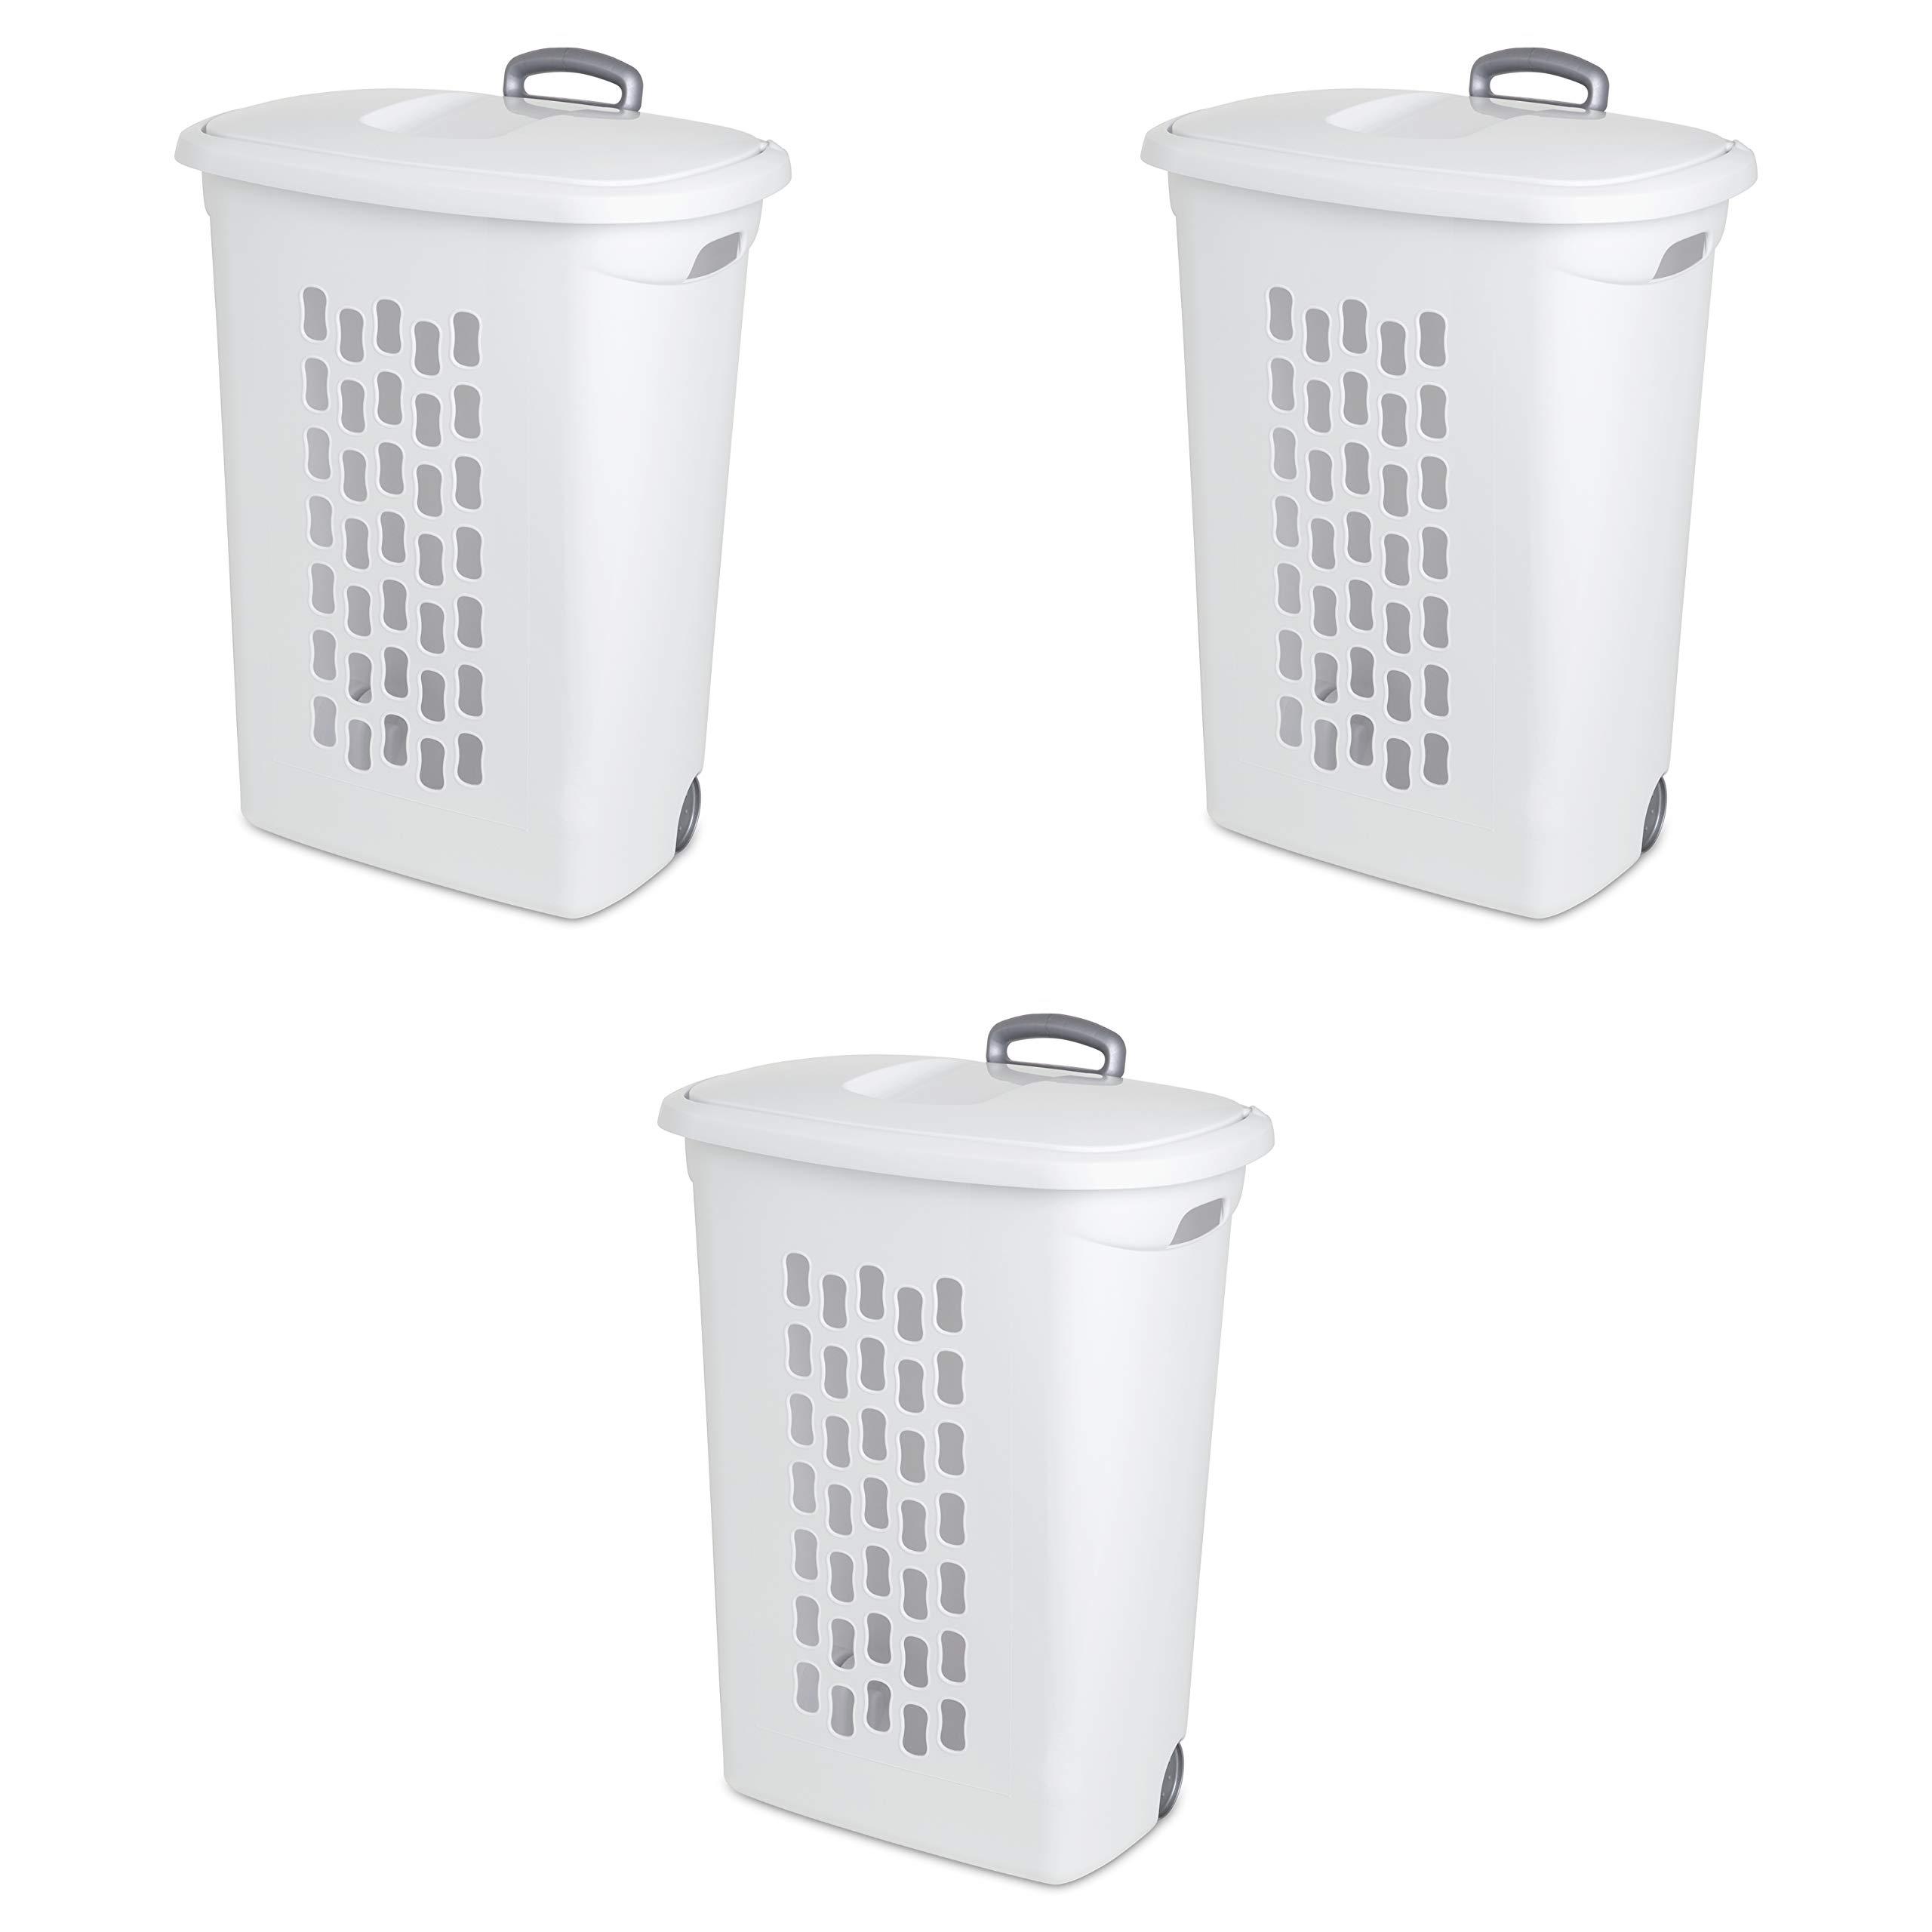 Sterilite 12258004 Ultra Easy Carry Hamper 4-Pack White Hamper w//Titanium Inserts